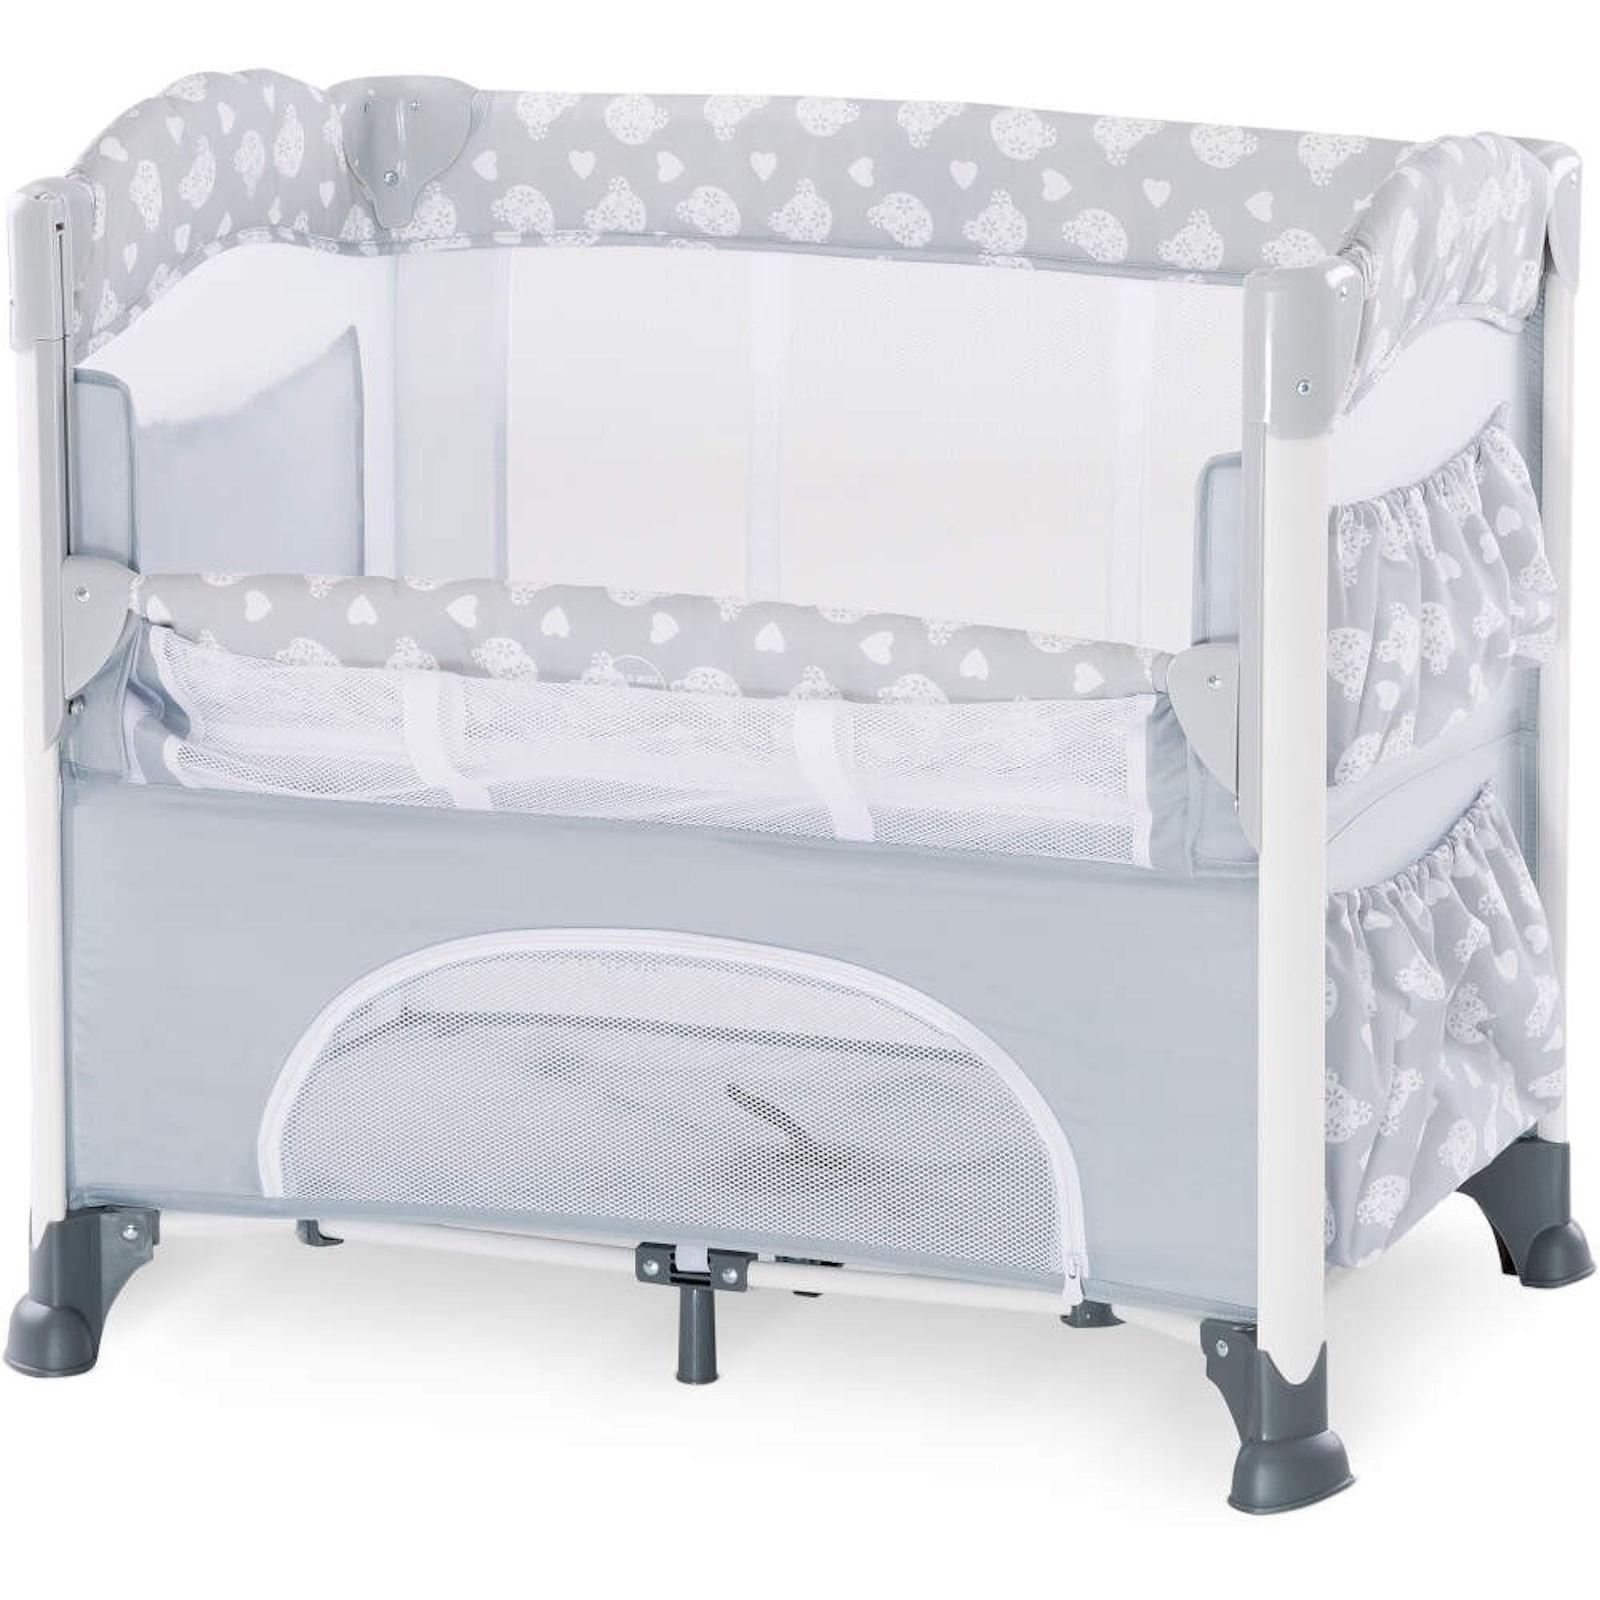 Hauck Sleep N Care Plus Travel Cot Bedside Crib Teddy